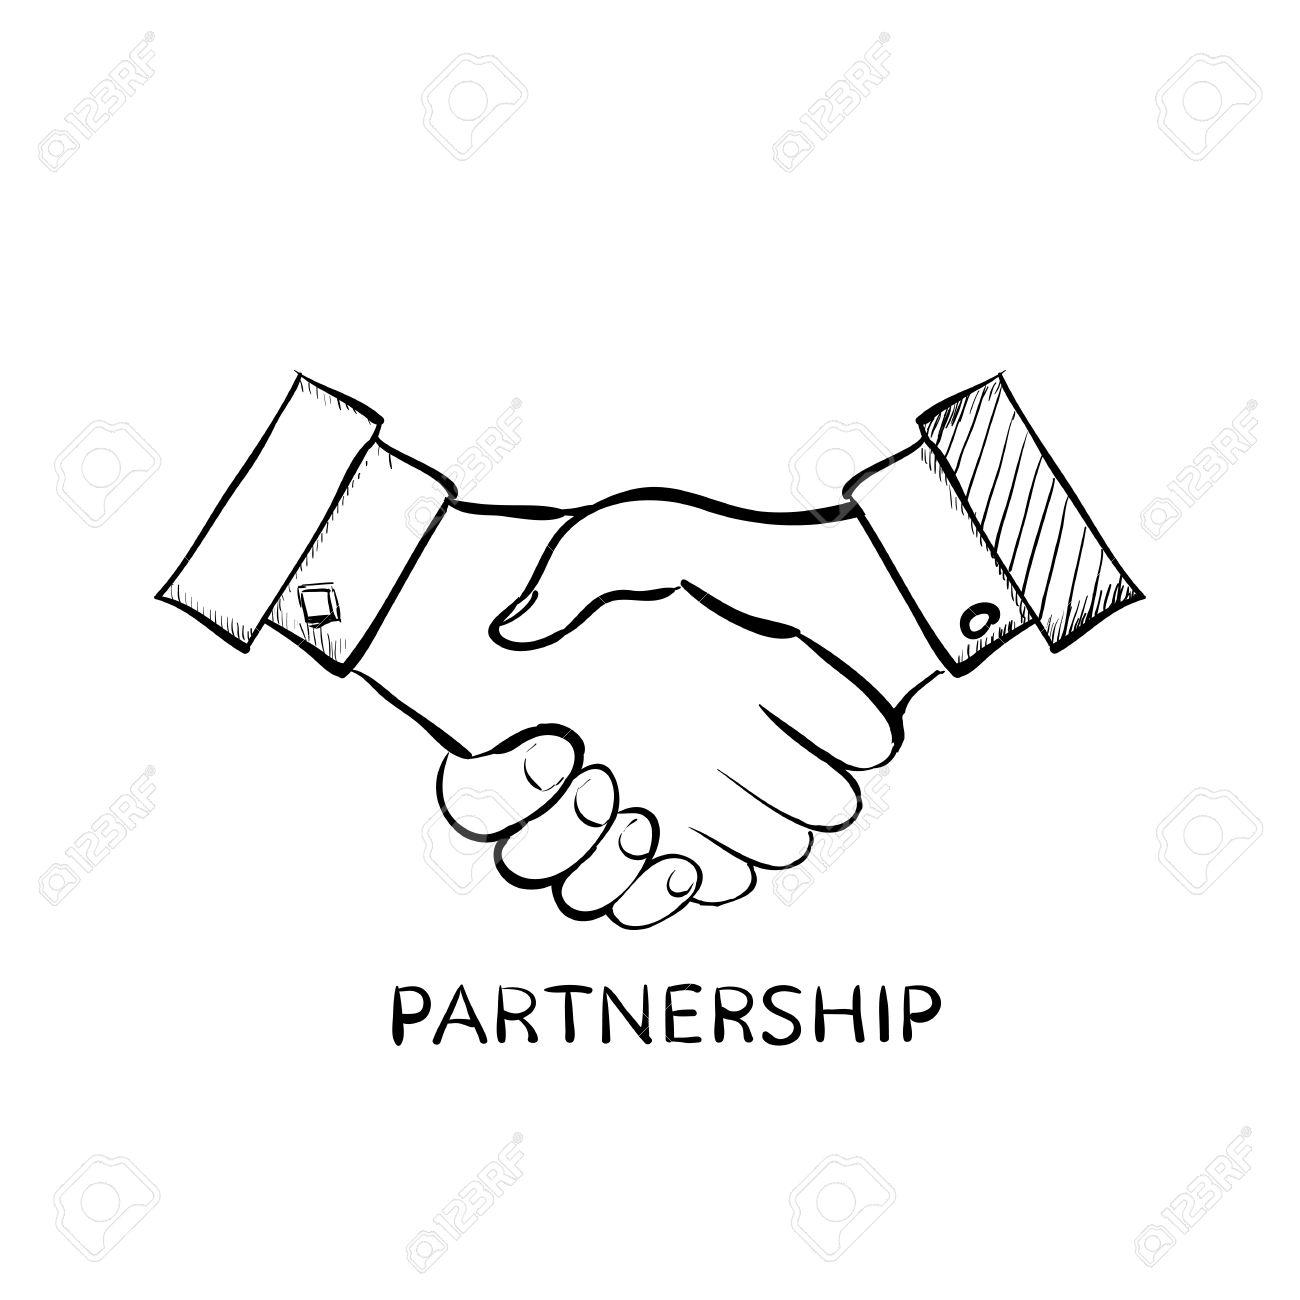 1300x1300 Handshake Of Two Men. Symbol Of Partnership. Doodle Image. Stock